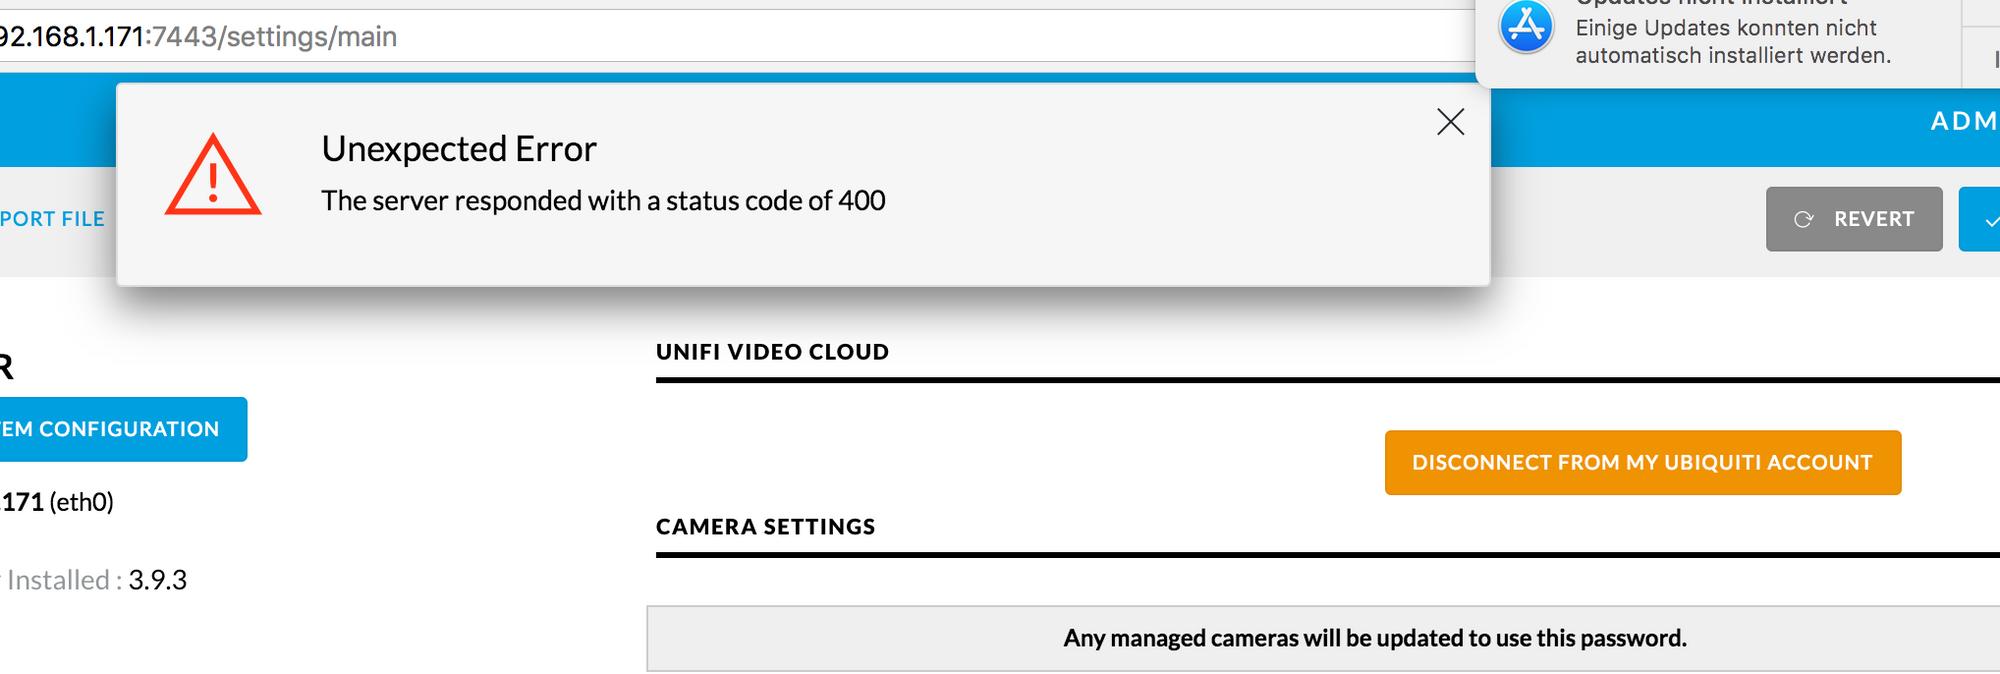 Cloud adoption not working with NVR v3 9 3 | Ubiquiti Community